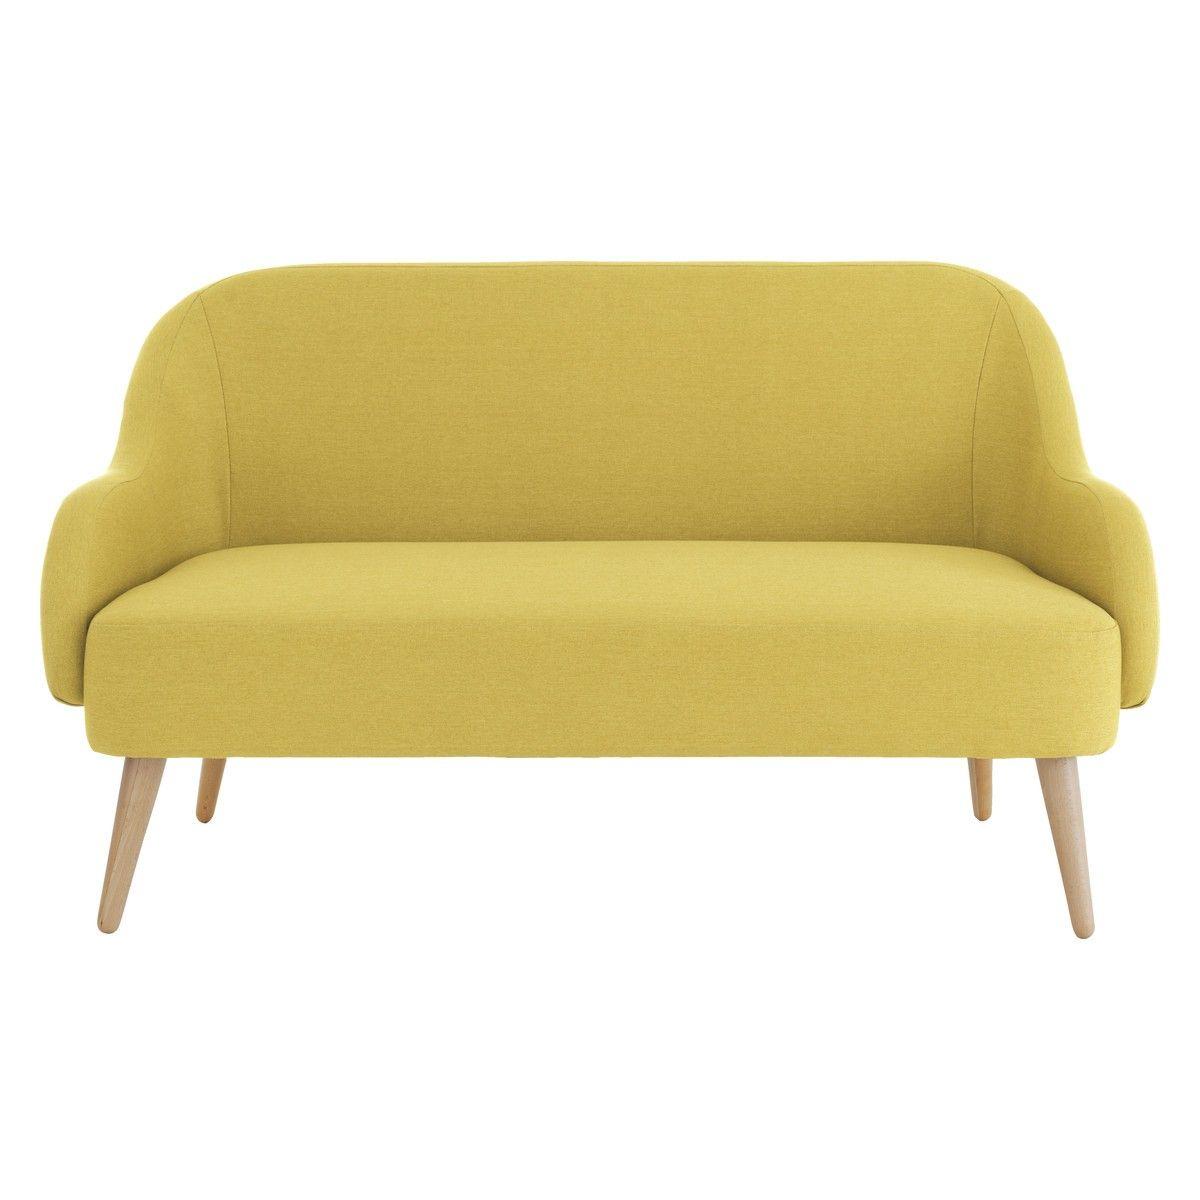 MOMO Saffron yellow fabric 2 seater sofa | Yellow fabric ...